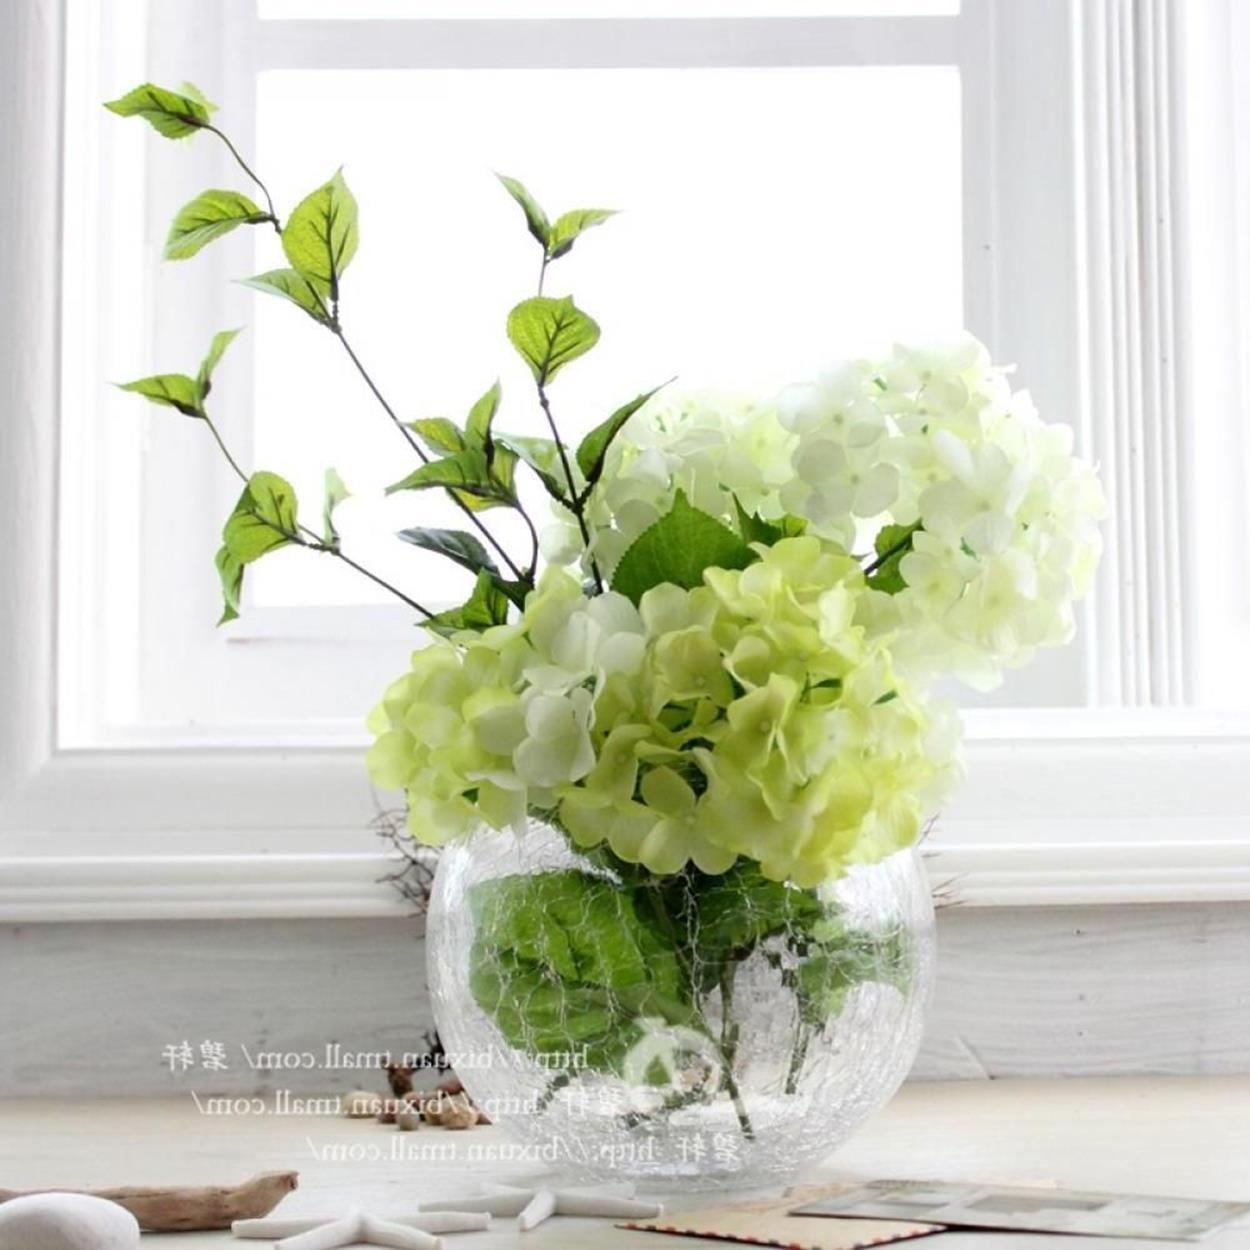 44 diy beautiful flower vase decoration ideas flowervase 44 diy beautiful flower vase decoration ideas flowervase squarevasesideas vasesideaspots izmirmasajfo